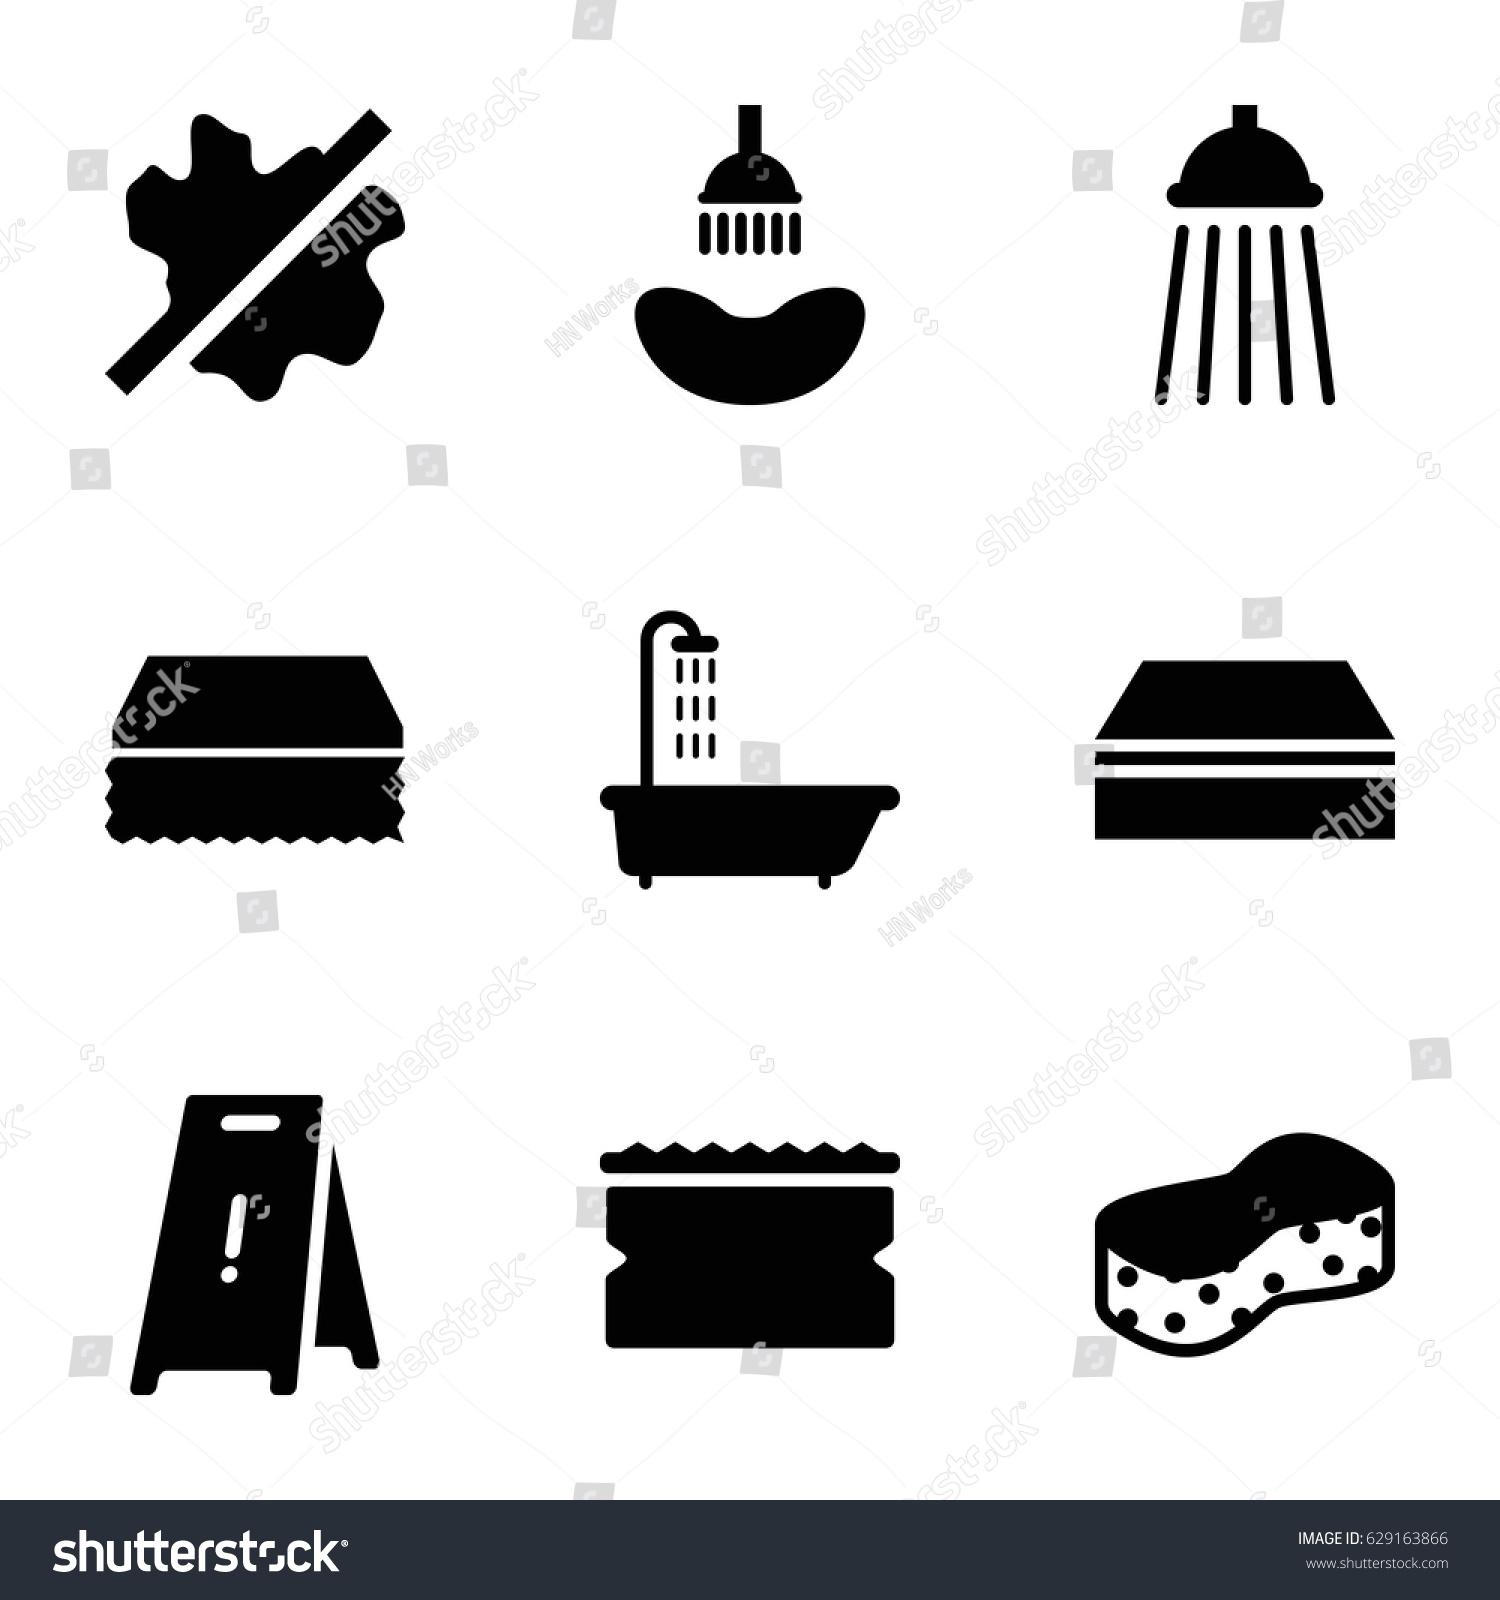 Wet icons set set 9 wet stock vector 629163866 shutterstock wet icons set set of 9 wet filled icons such as shower sponge biocorpaavc